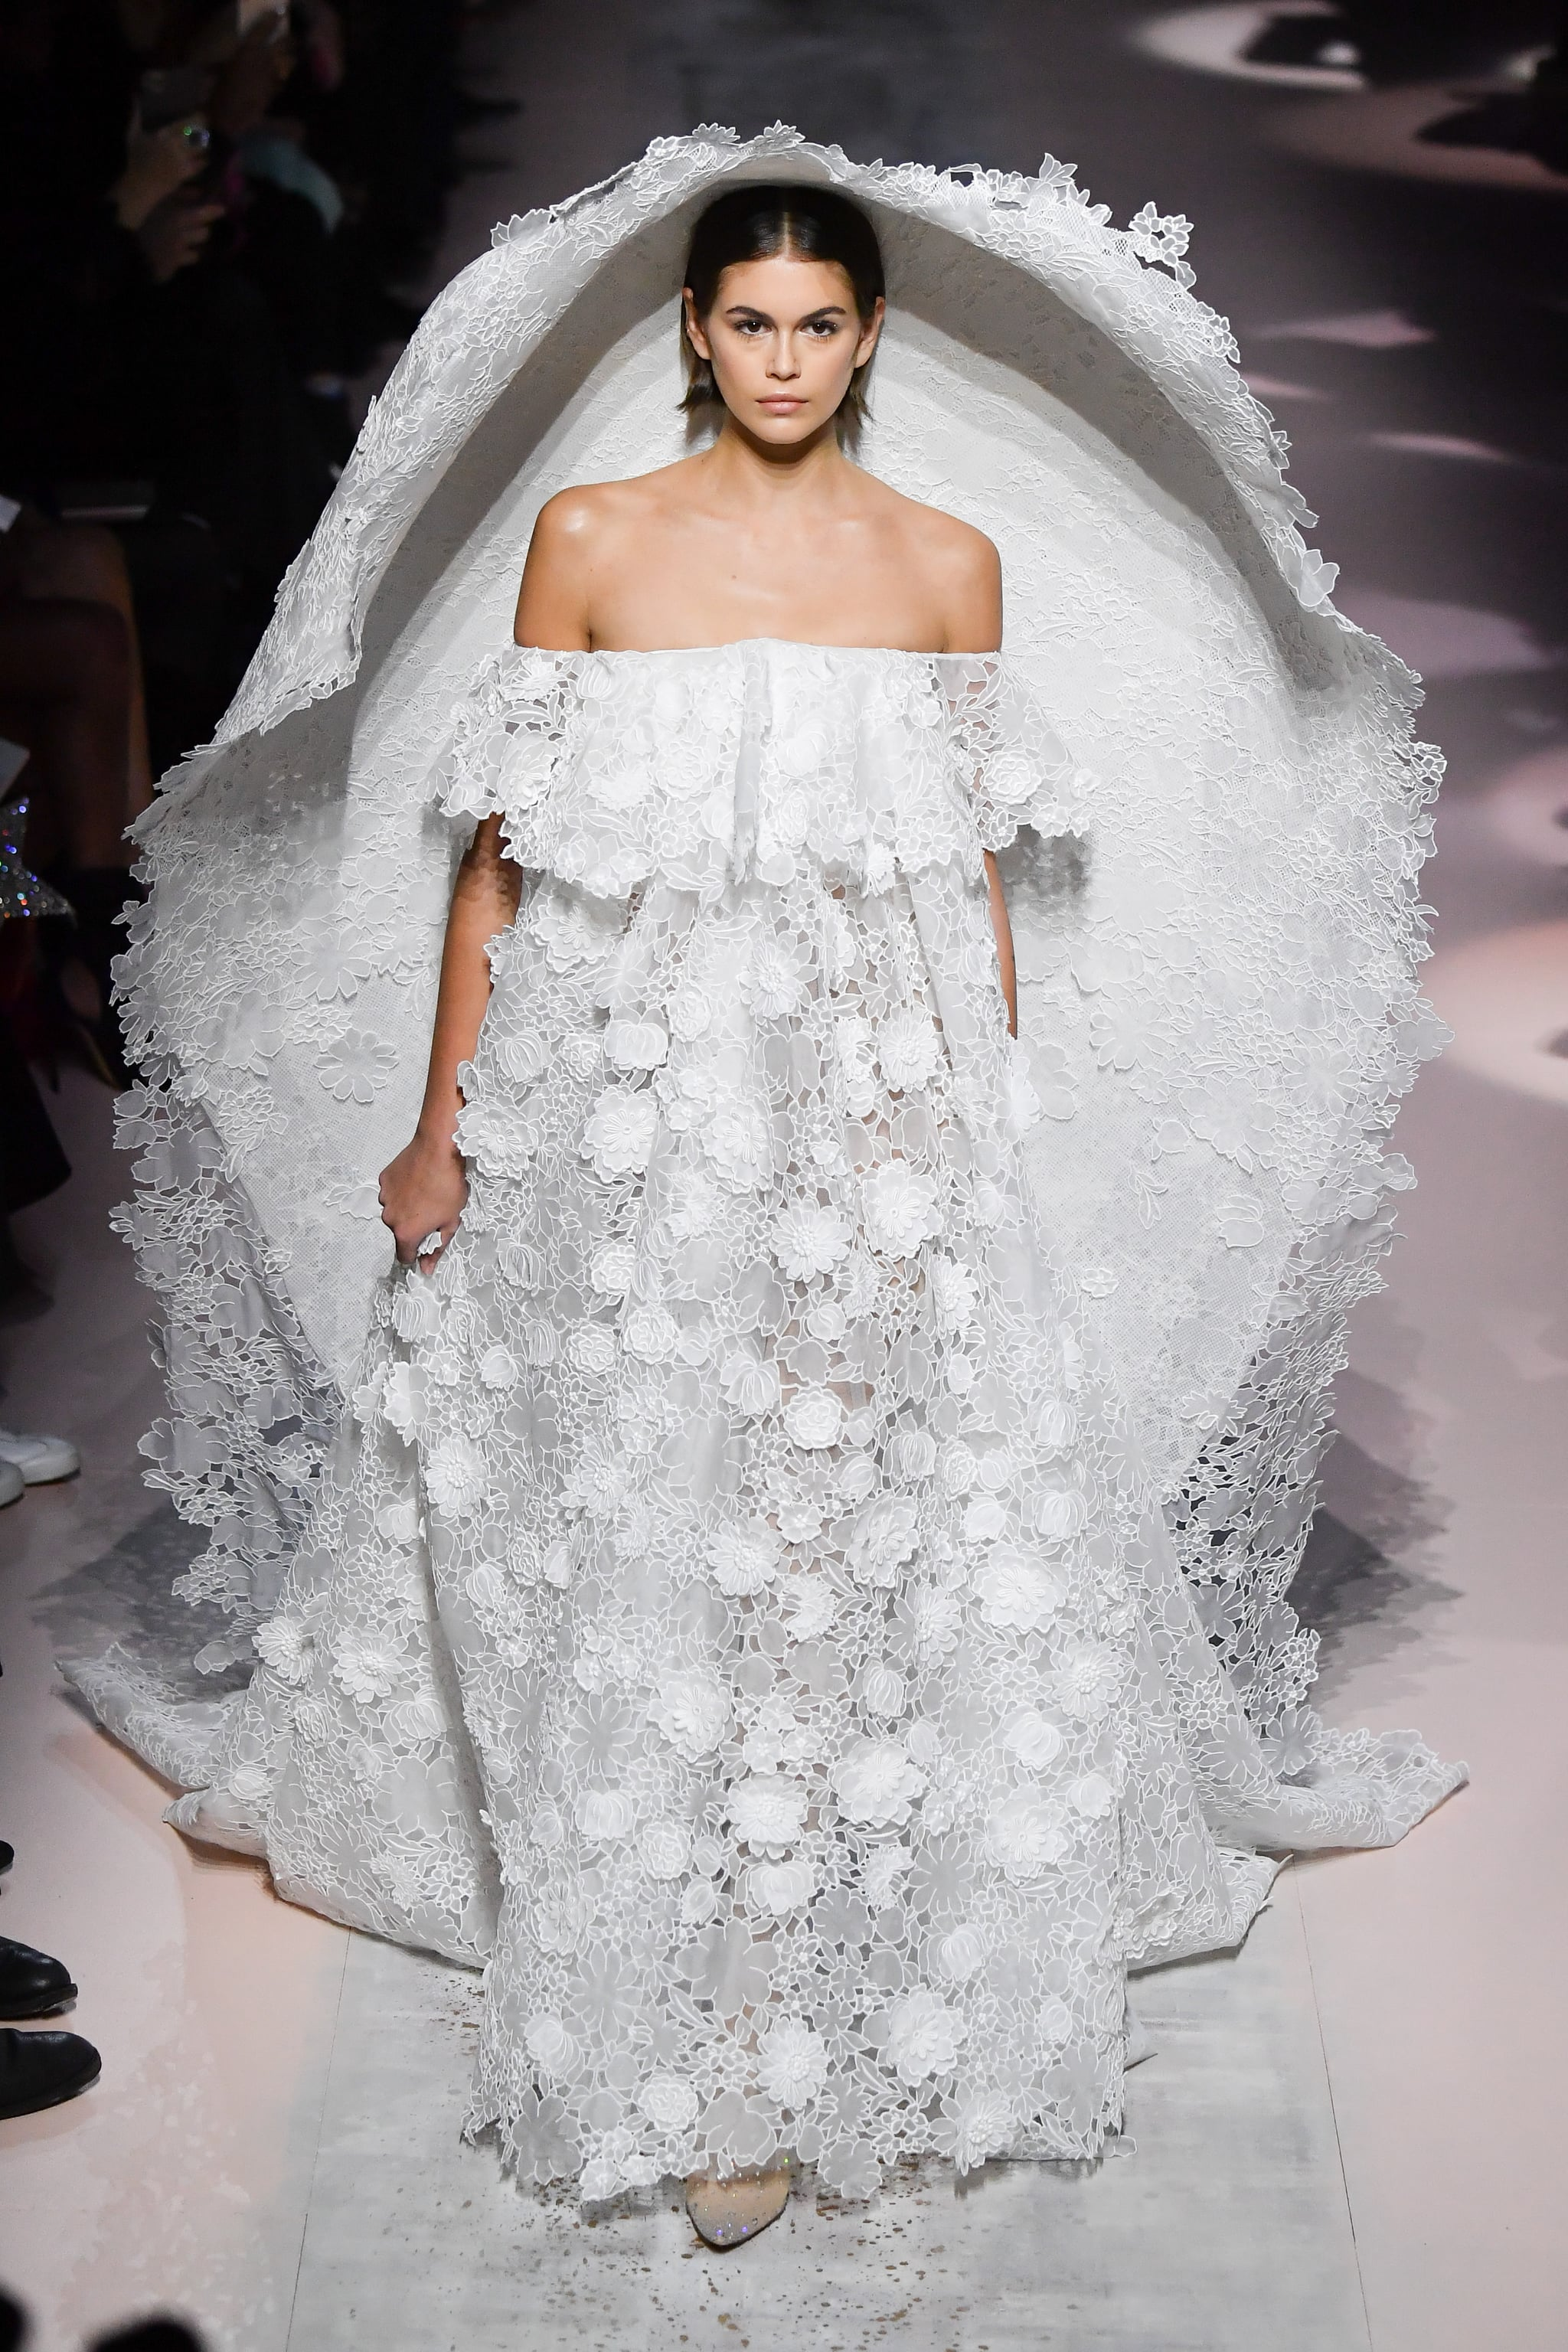 Kaia Gerber Givenchy Haute Couture Wedding Dress Photos Popsugar Fashion,Charlotte York Wedding Dress Badgley Mischka